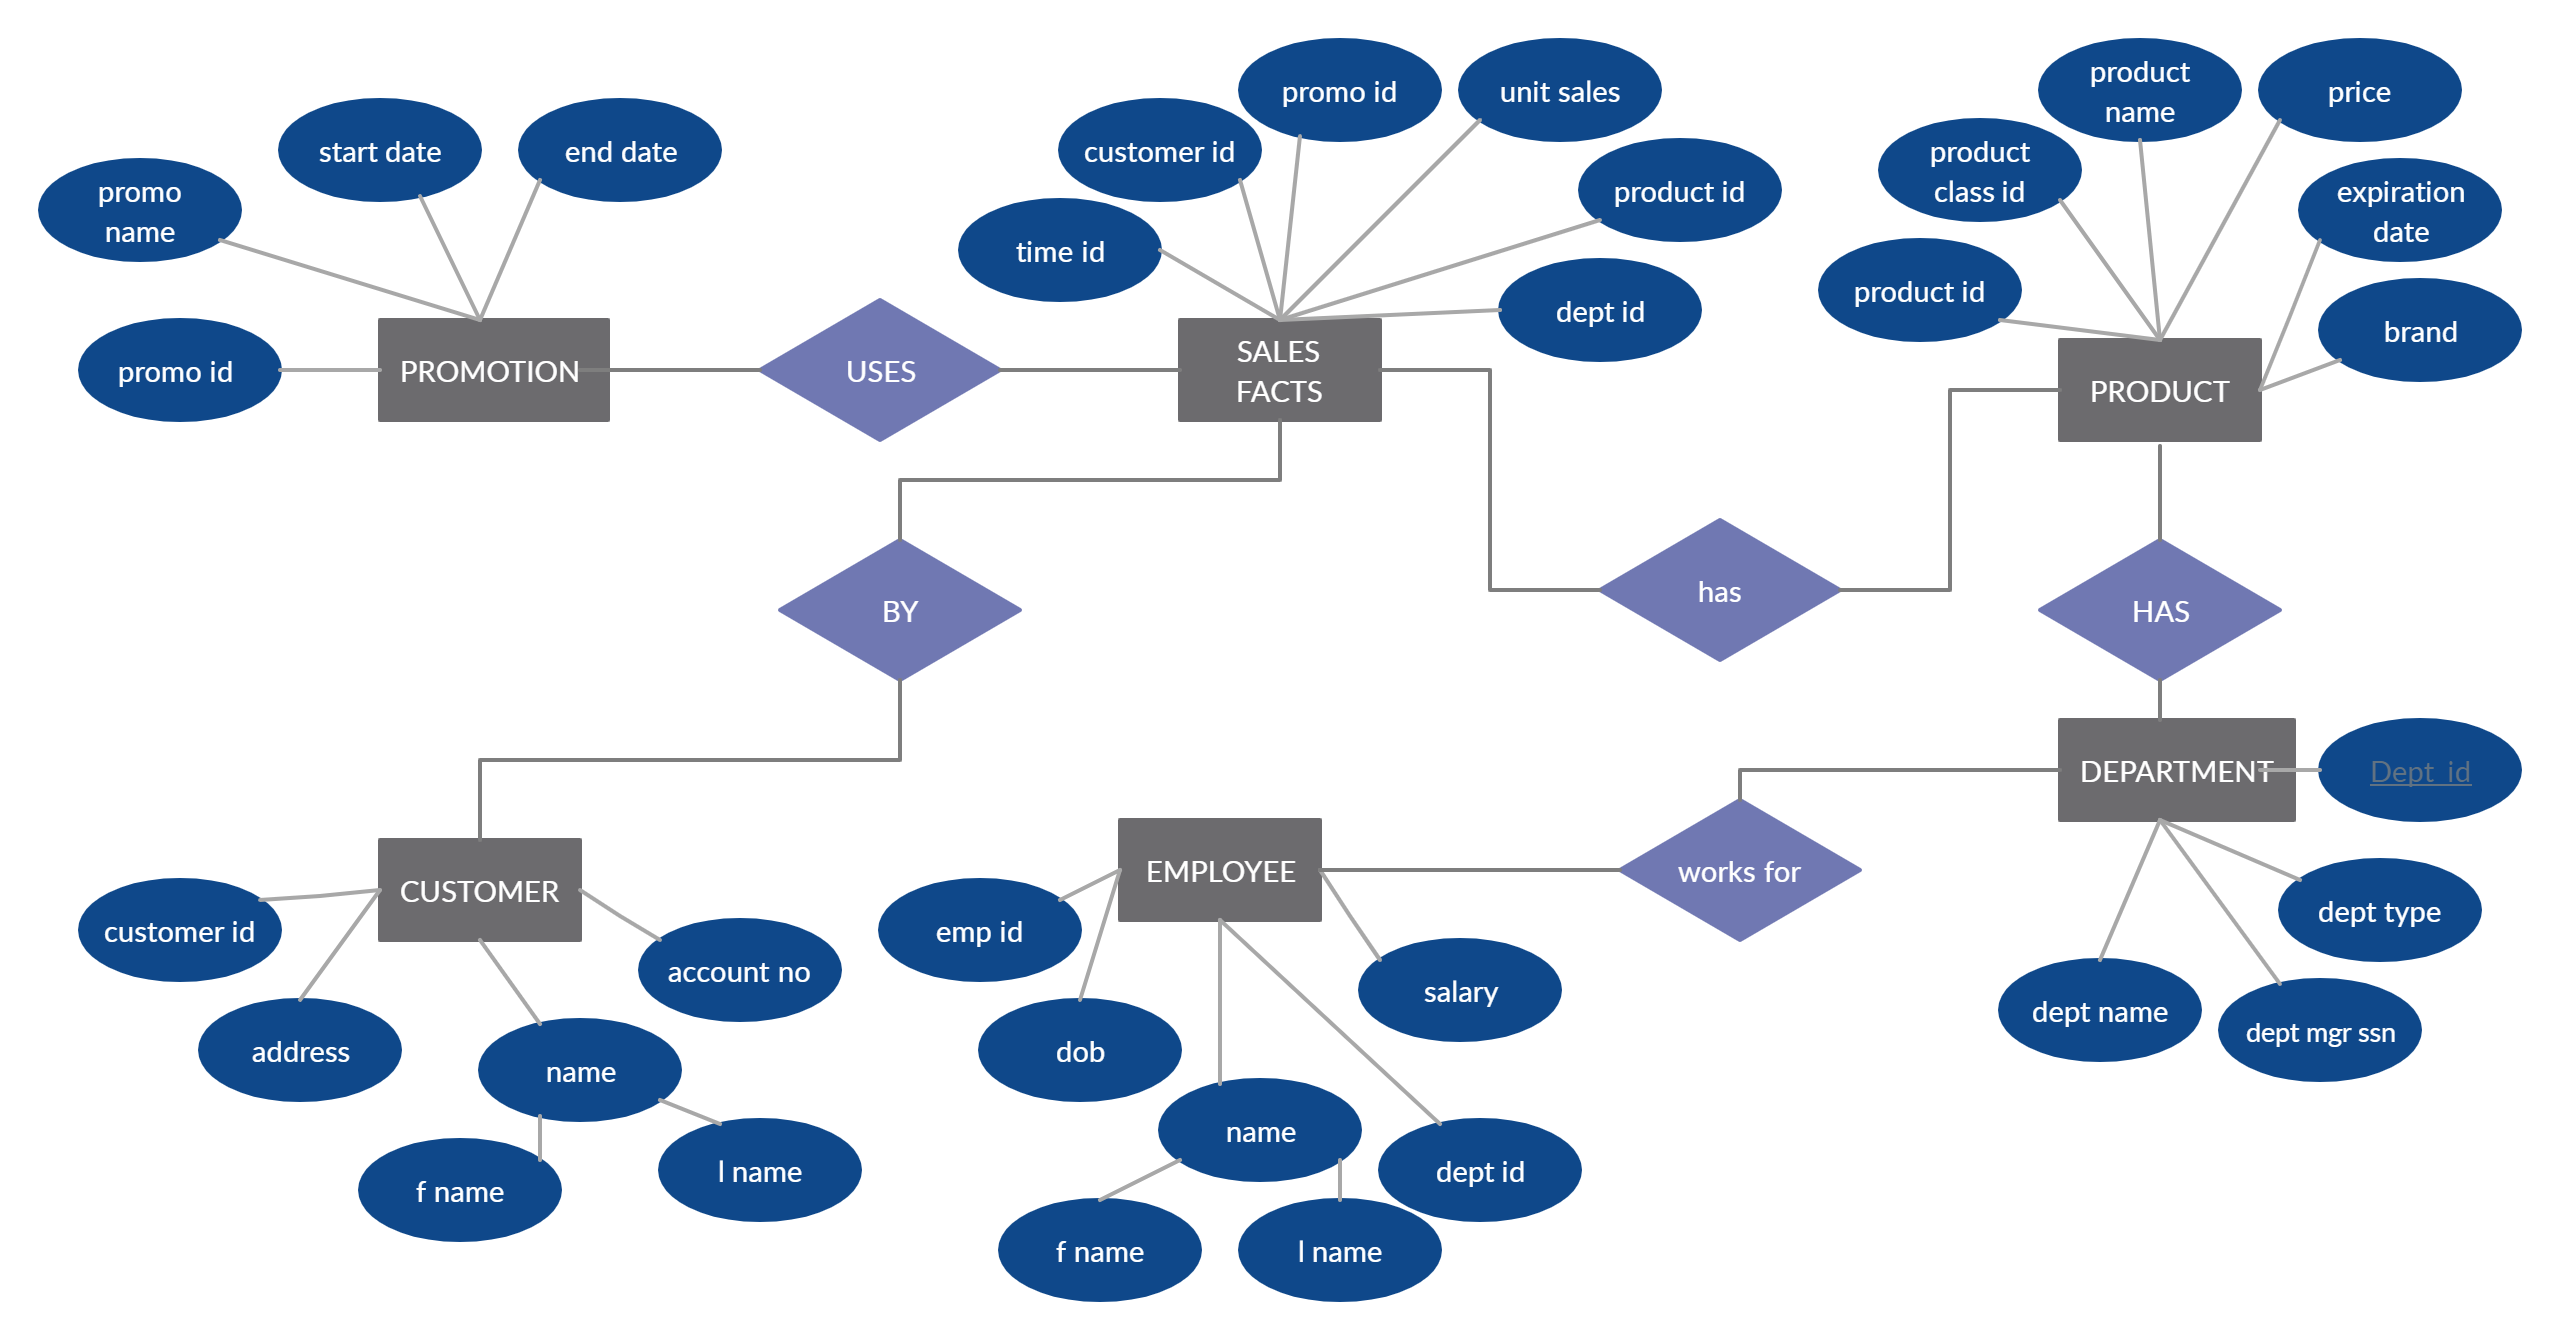 Entity Relationship Diagram Of Supermarket | Relationship